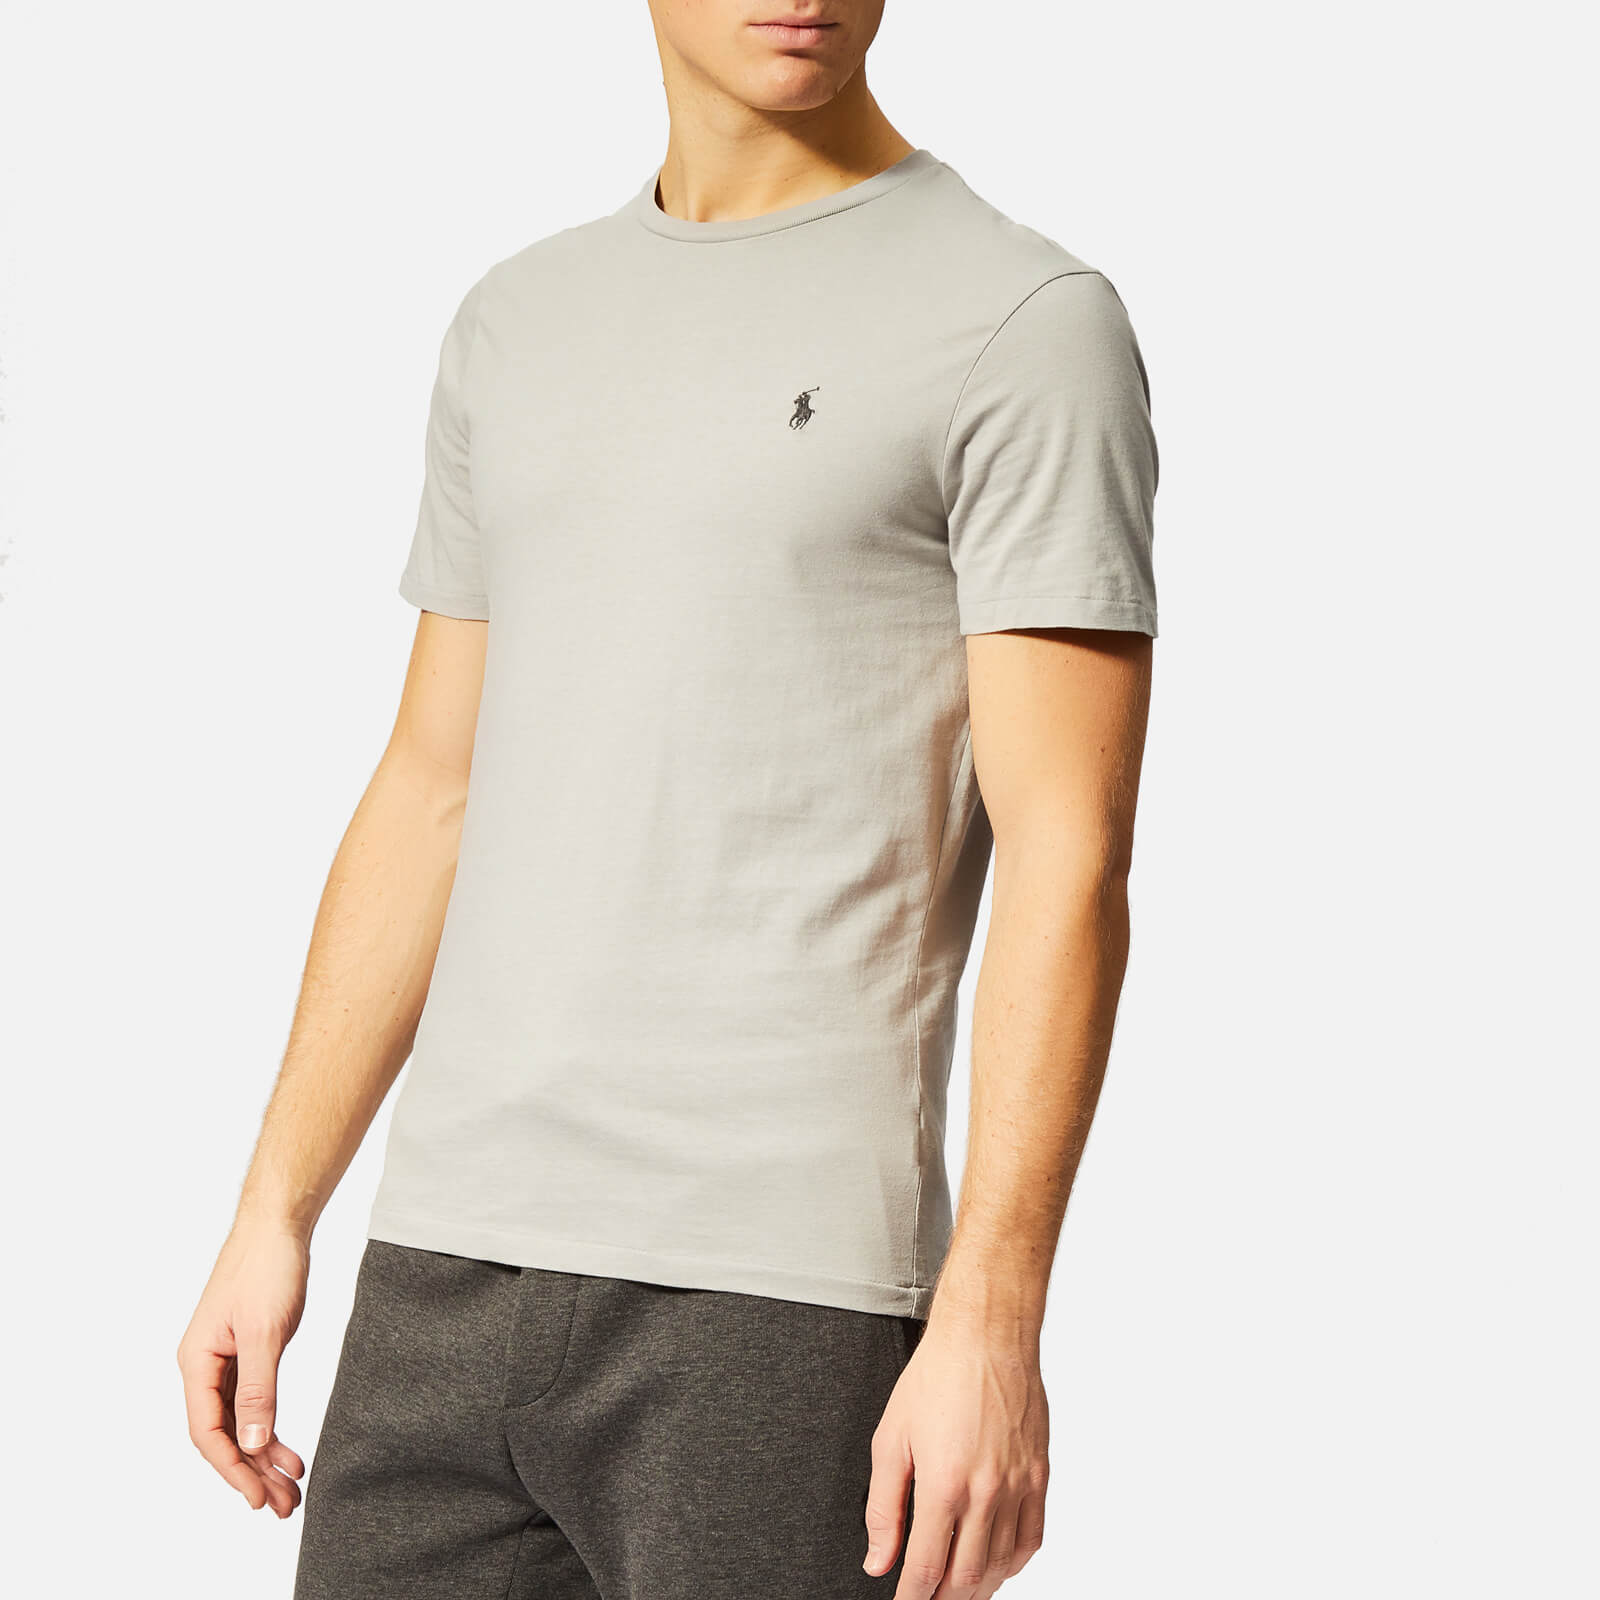 da111995 Polo Ralph Lauren Men's Custom Slim Fit Crew Neck T-Shirt - Soft Grey -  Free UK Delivery over £50